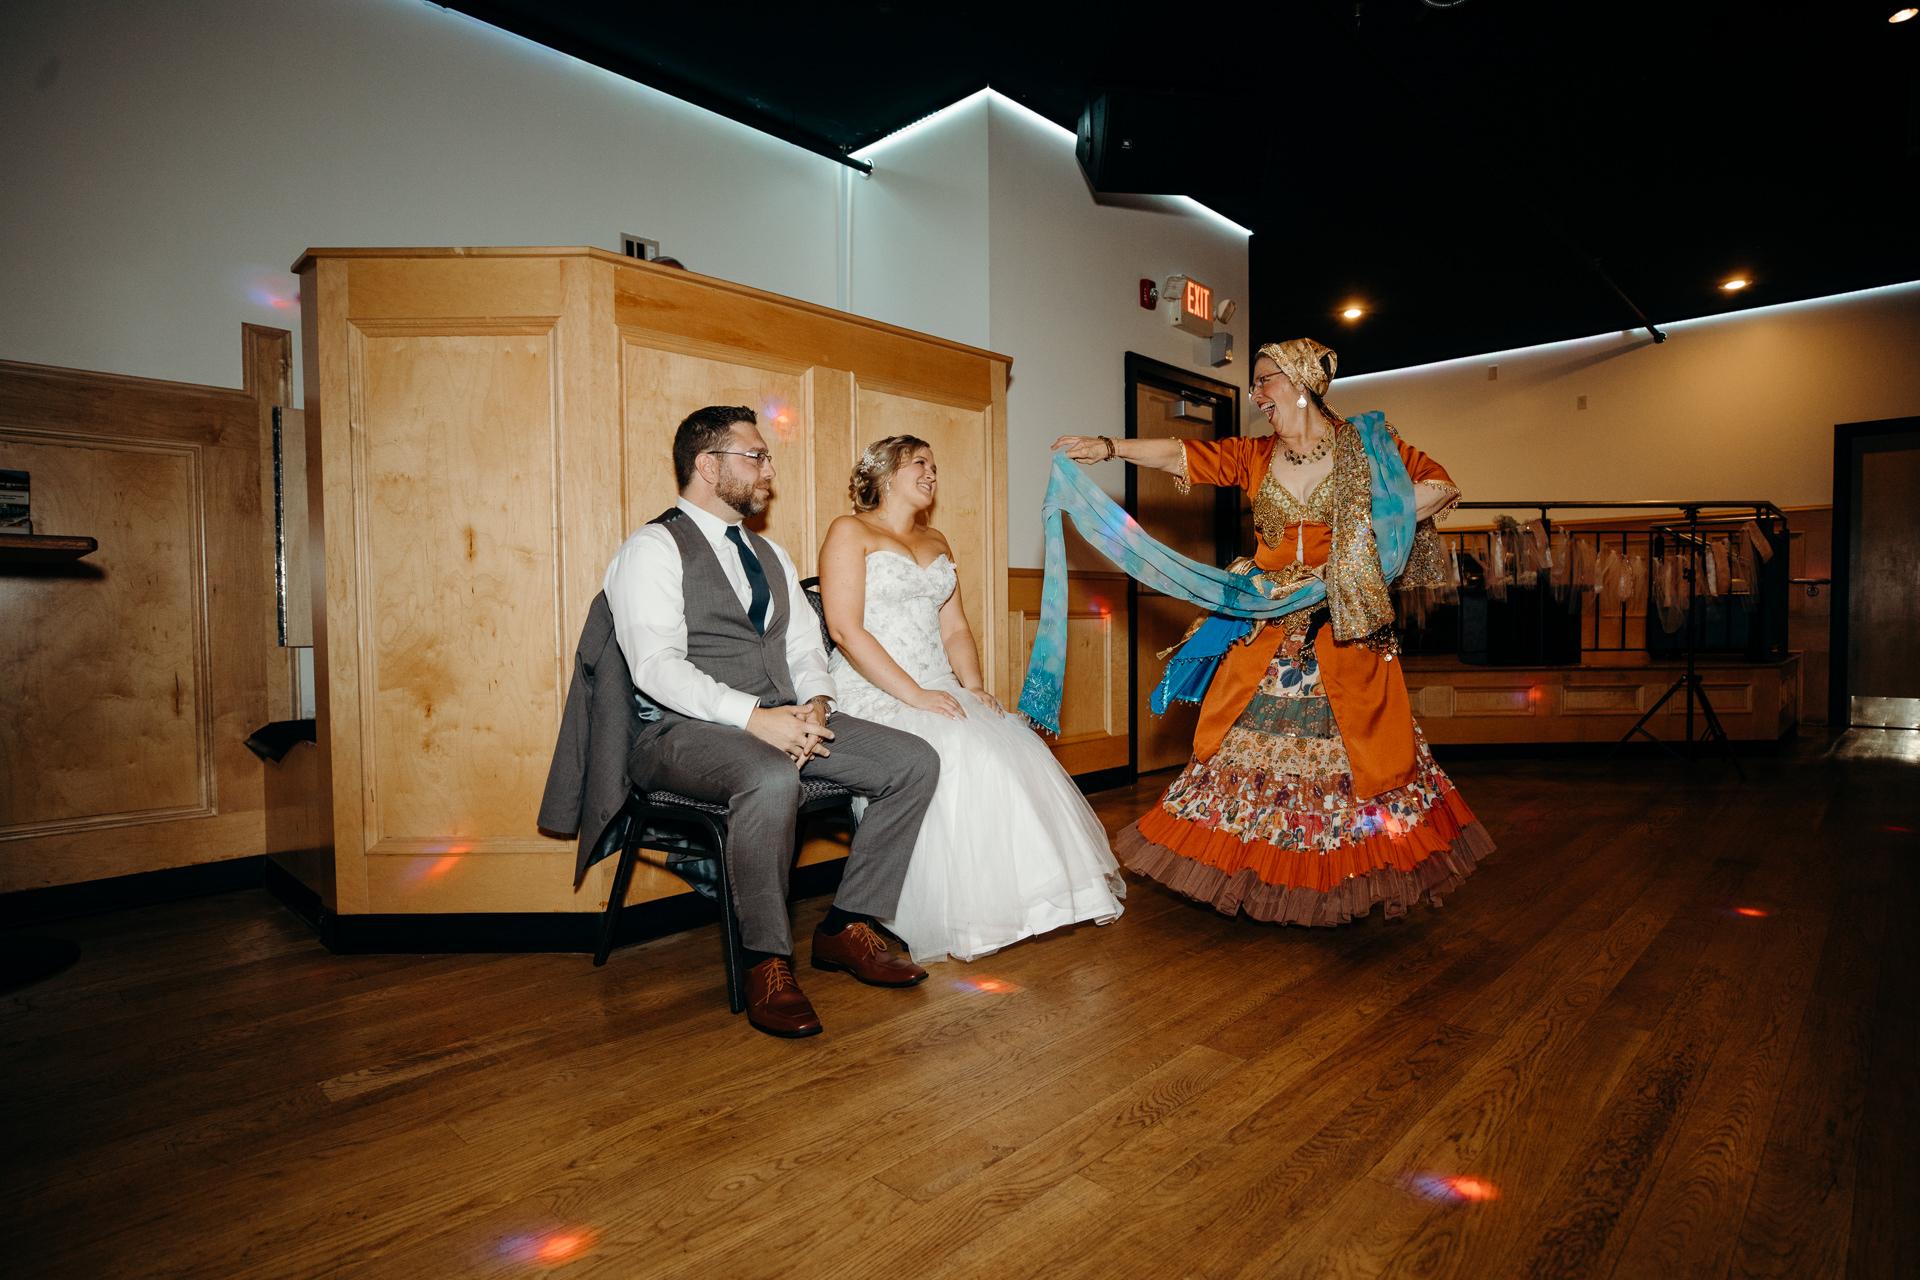 Grant Beachy Weddings photography elkhart south bend goshen warsaw-060.jpg